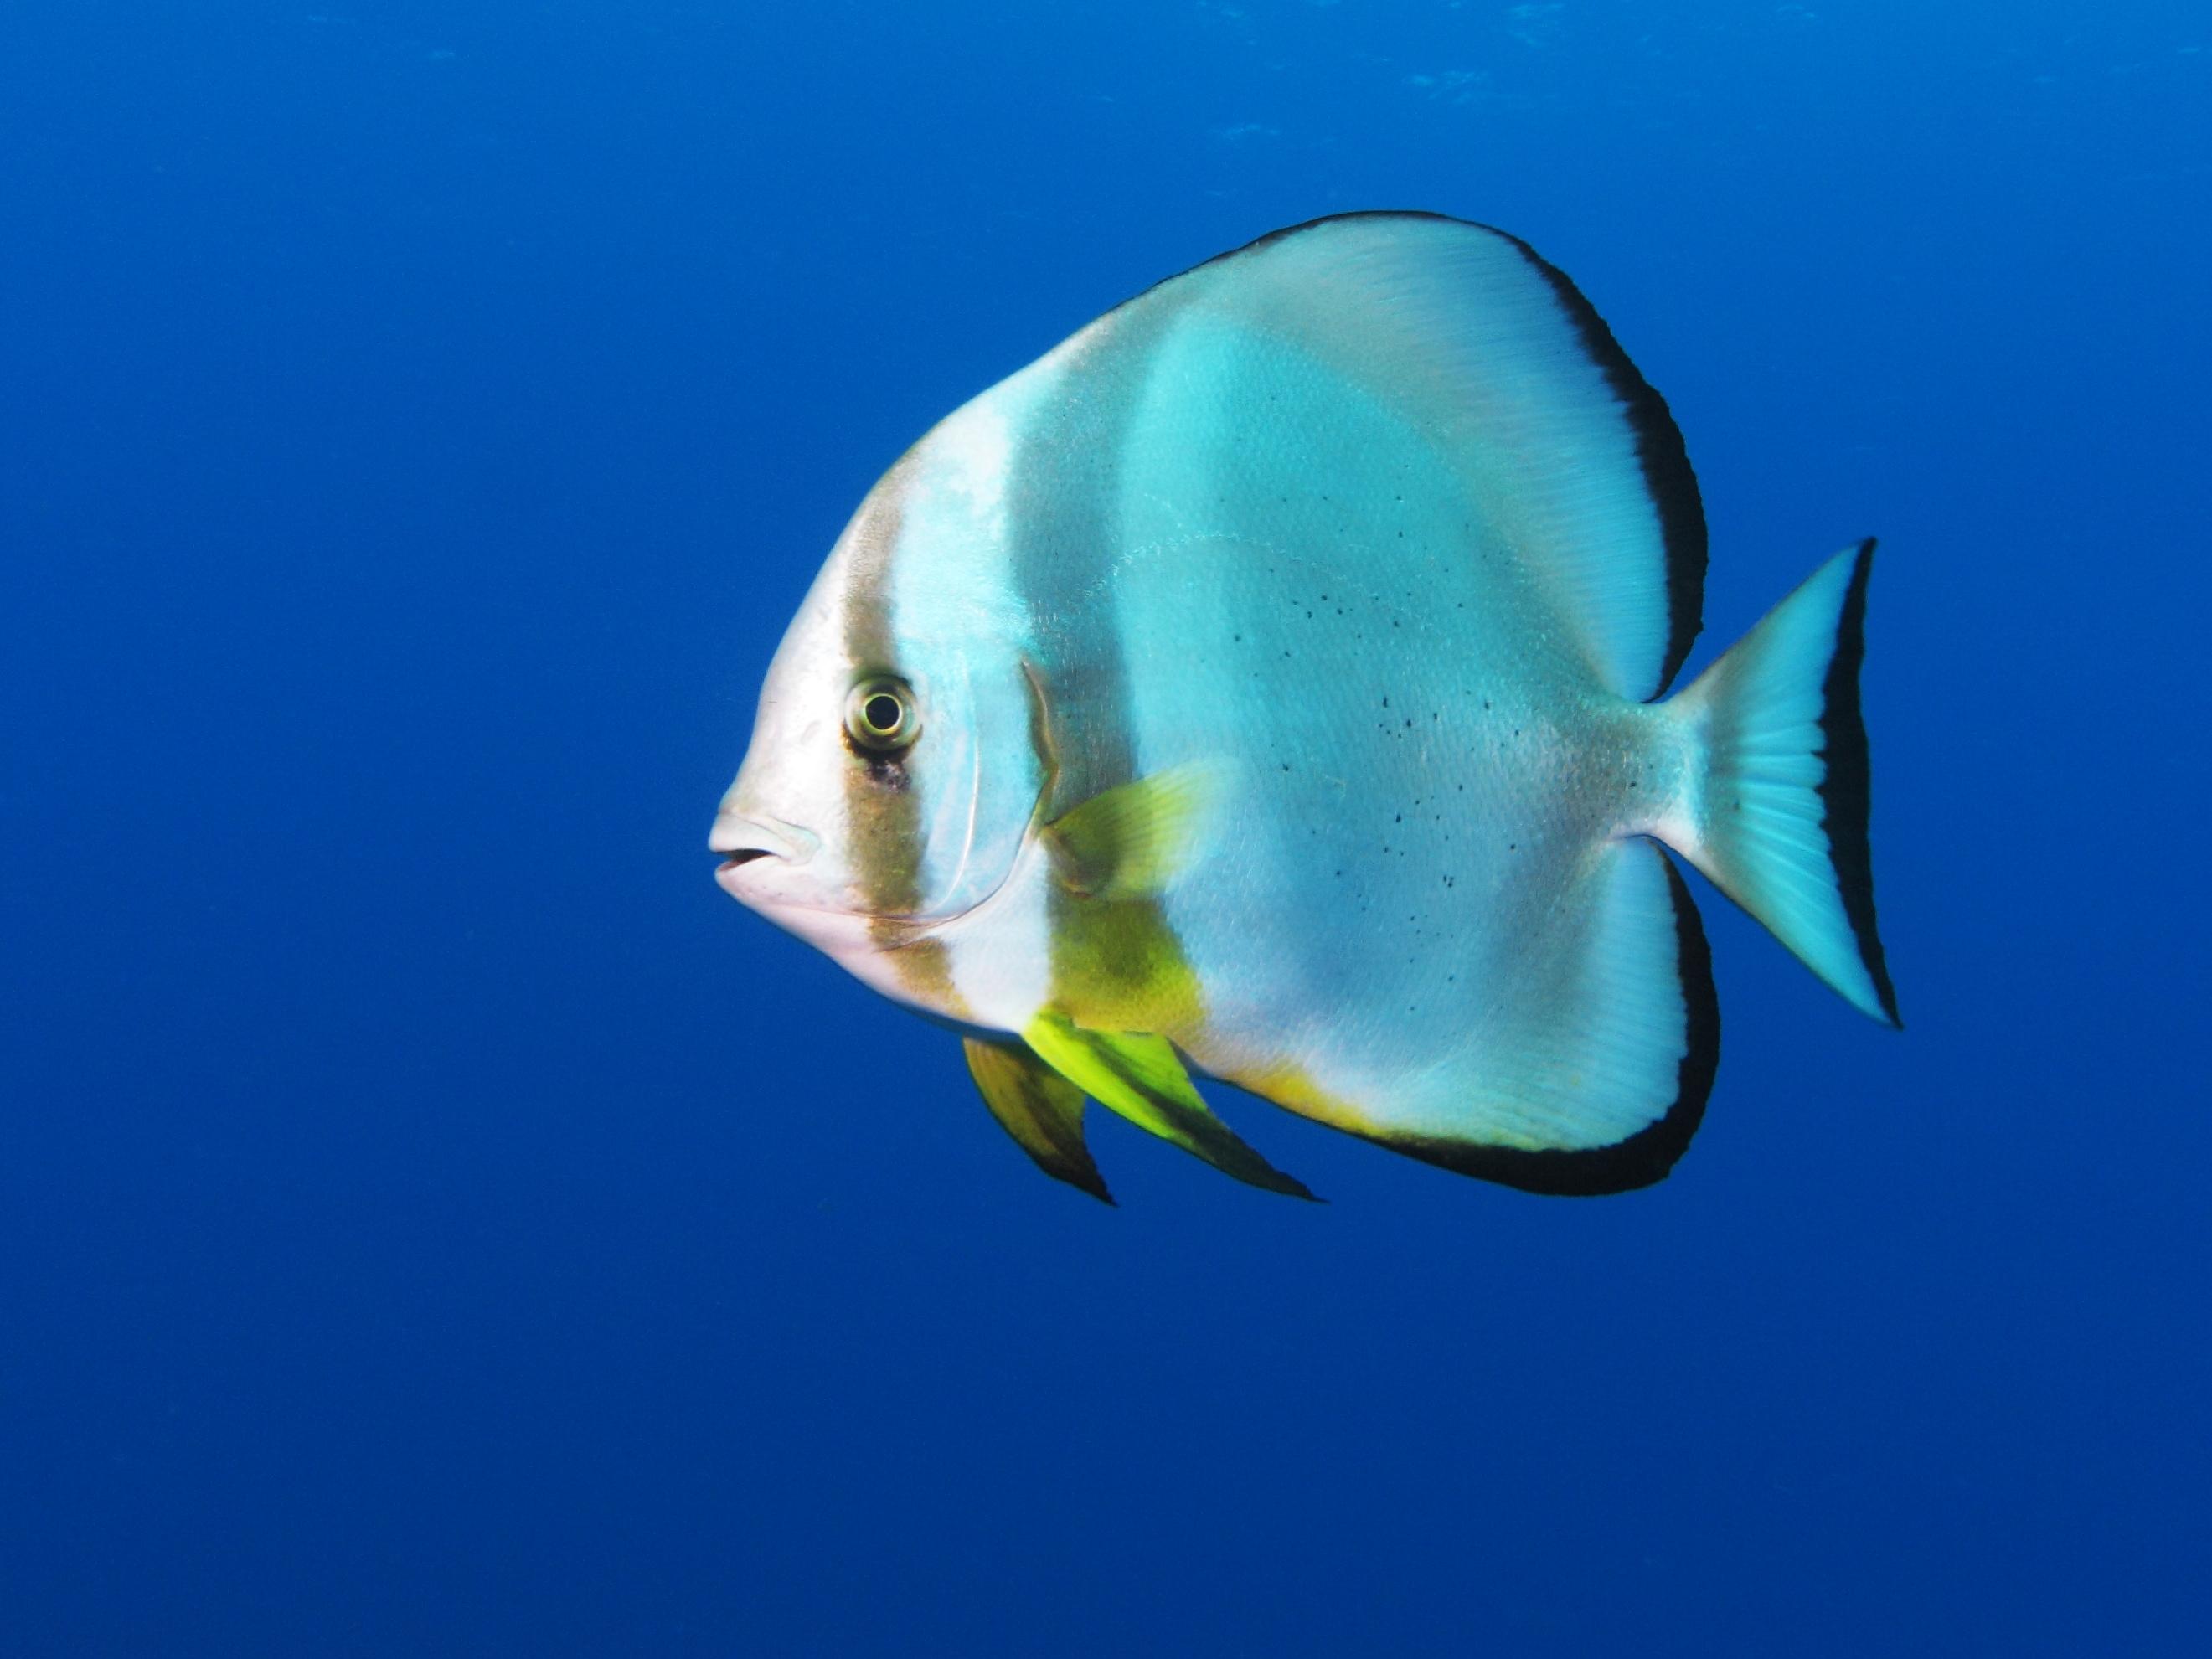 File:Platax Orbicularis in the Egyptian Red Sea.jpg - Wikipedia, the ...